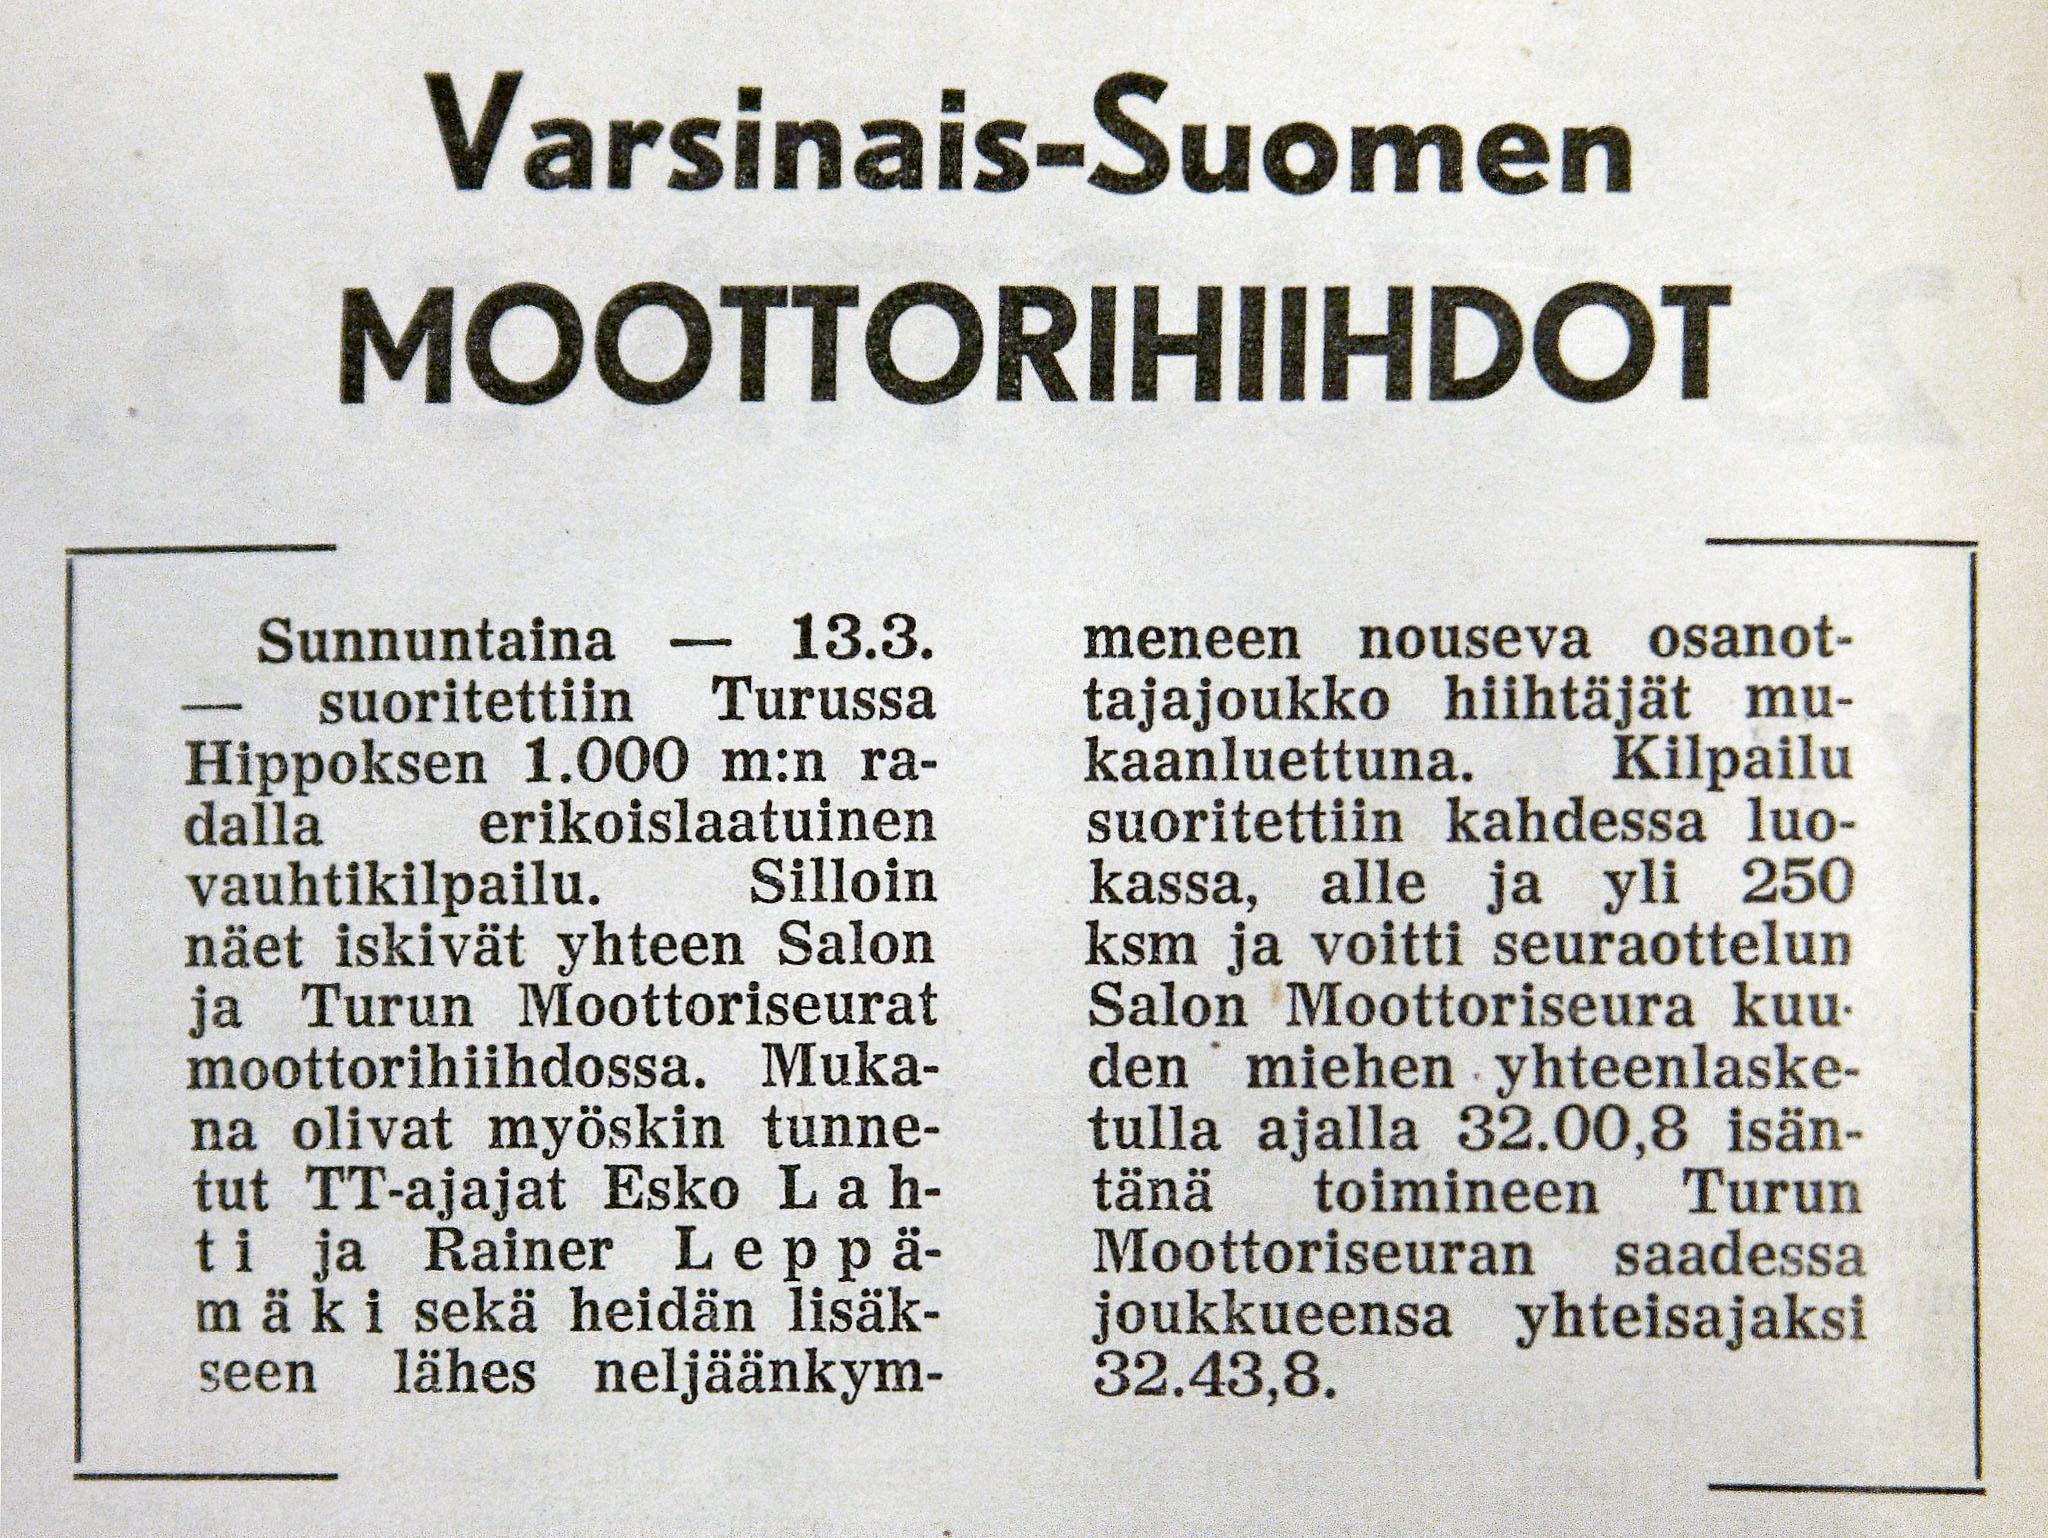 Mobilisti_Moottorihiihto_9